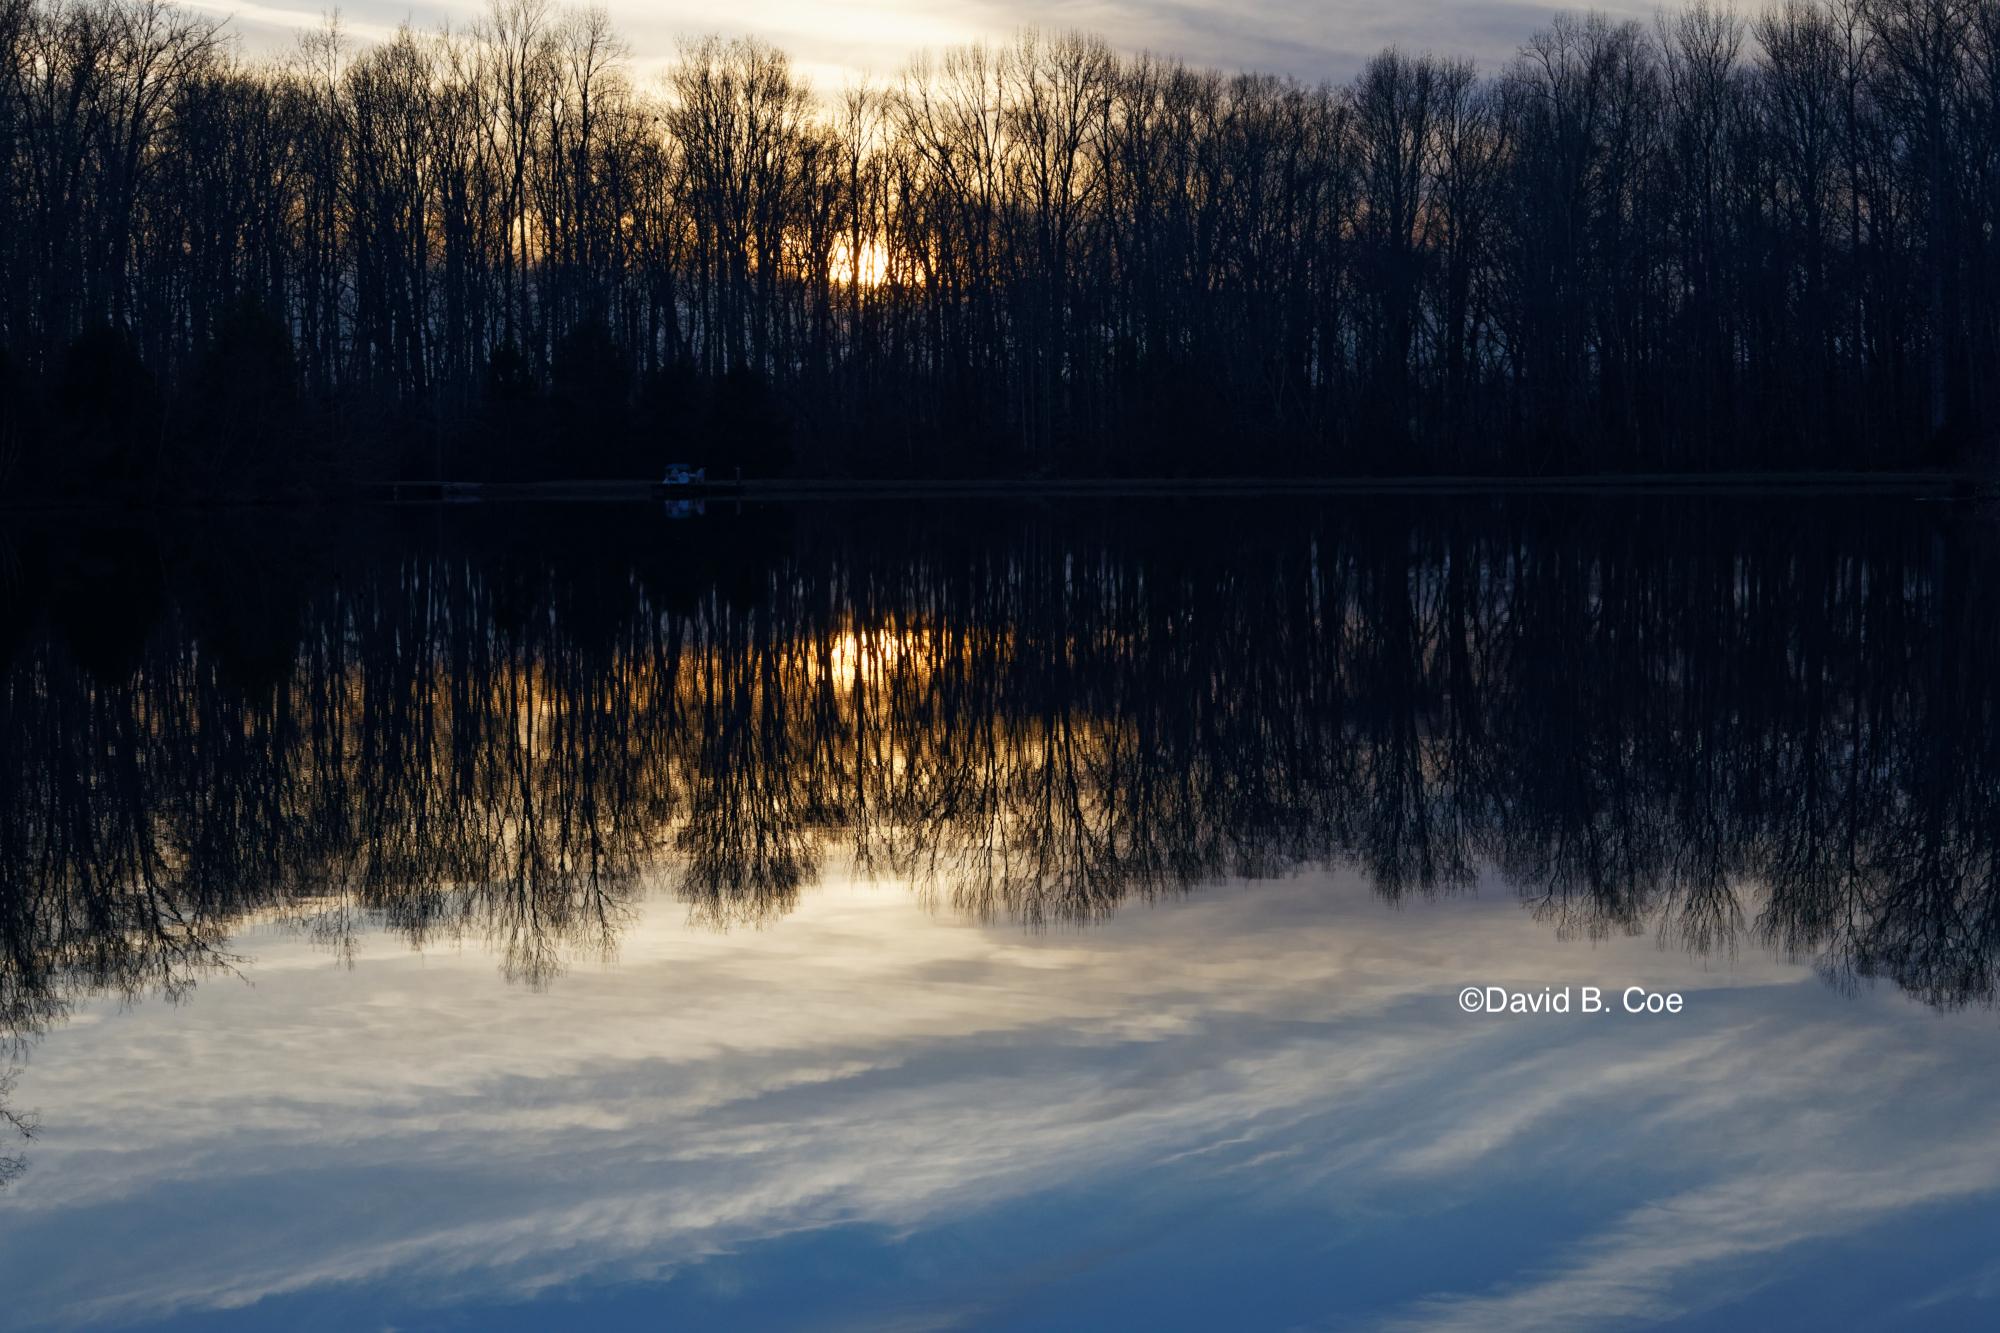 Twilight Pond Reflection, by David B. Coe